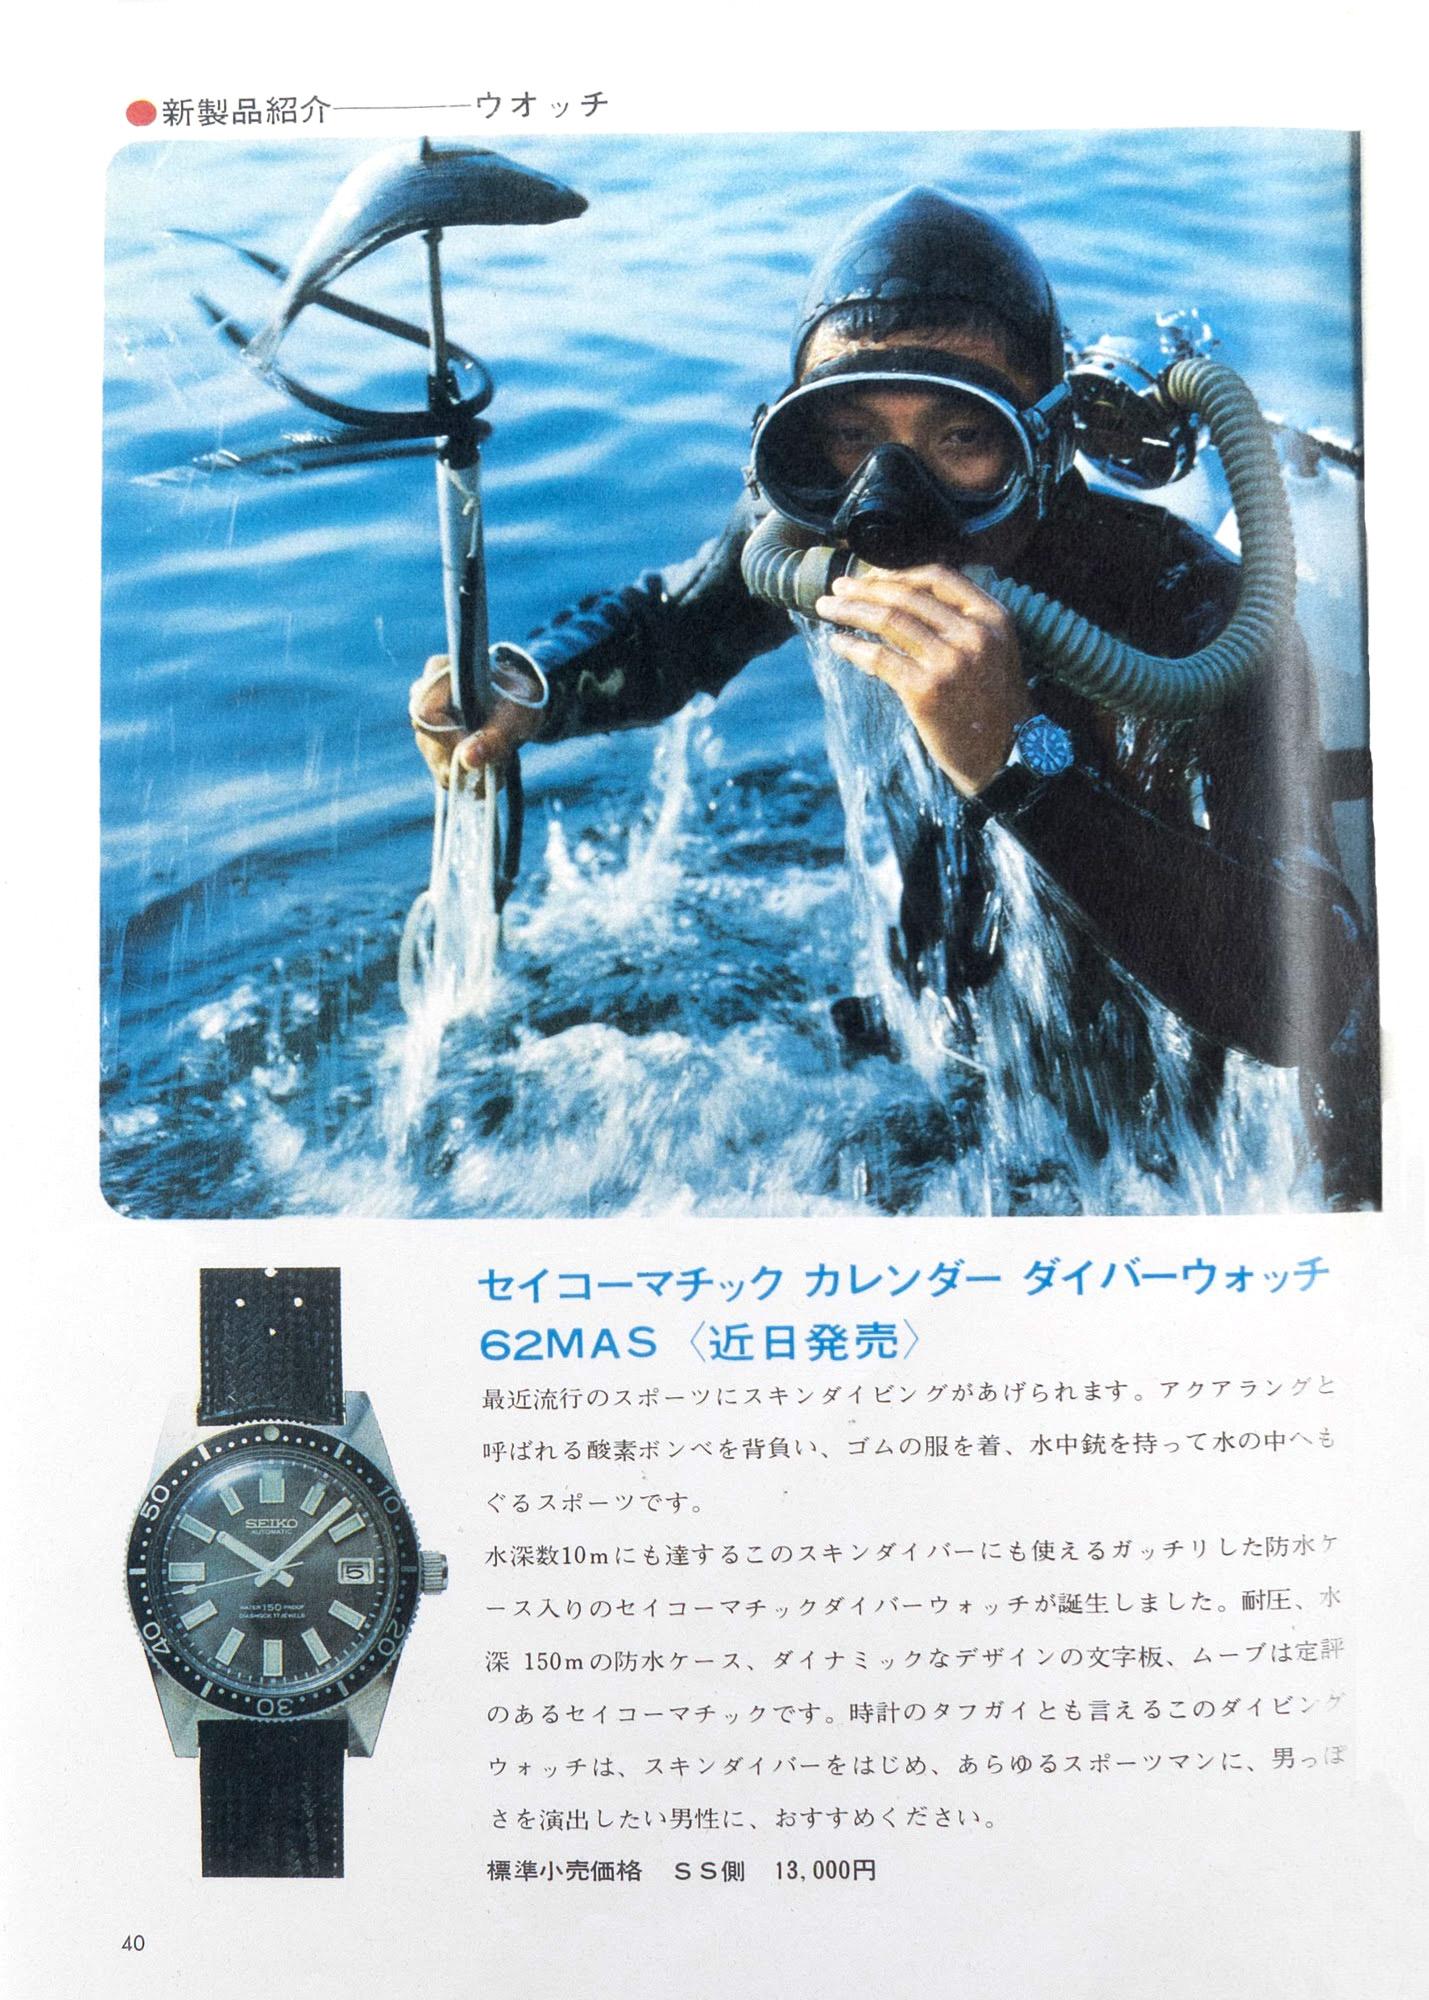 62MAS Advert